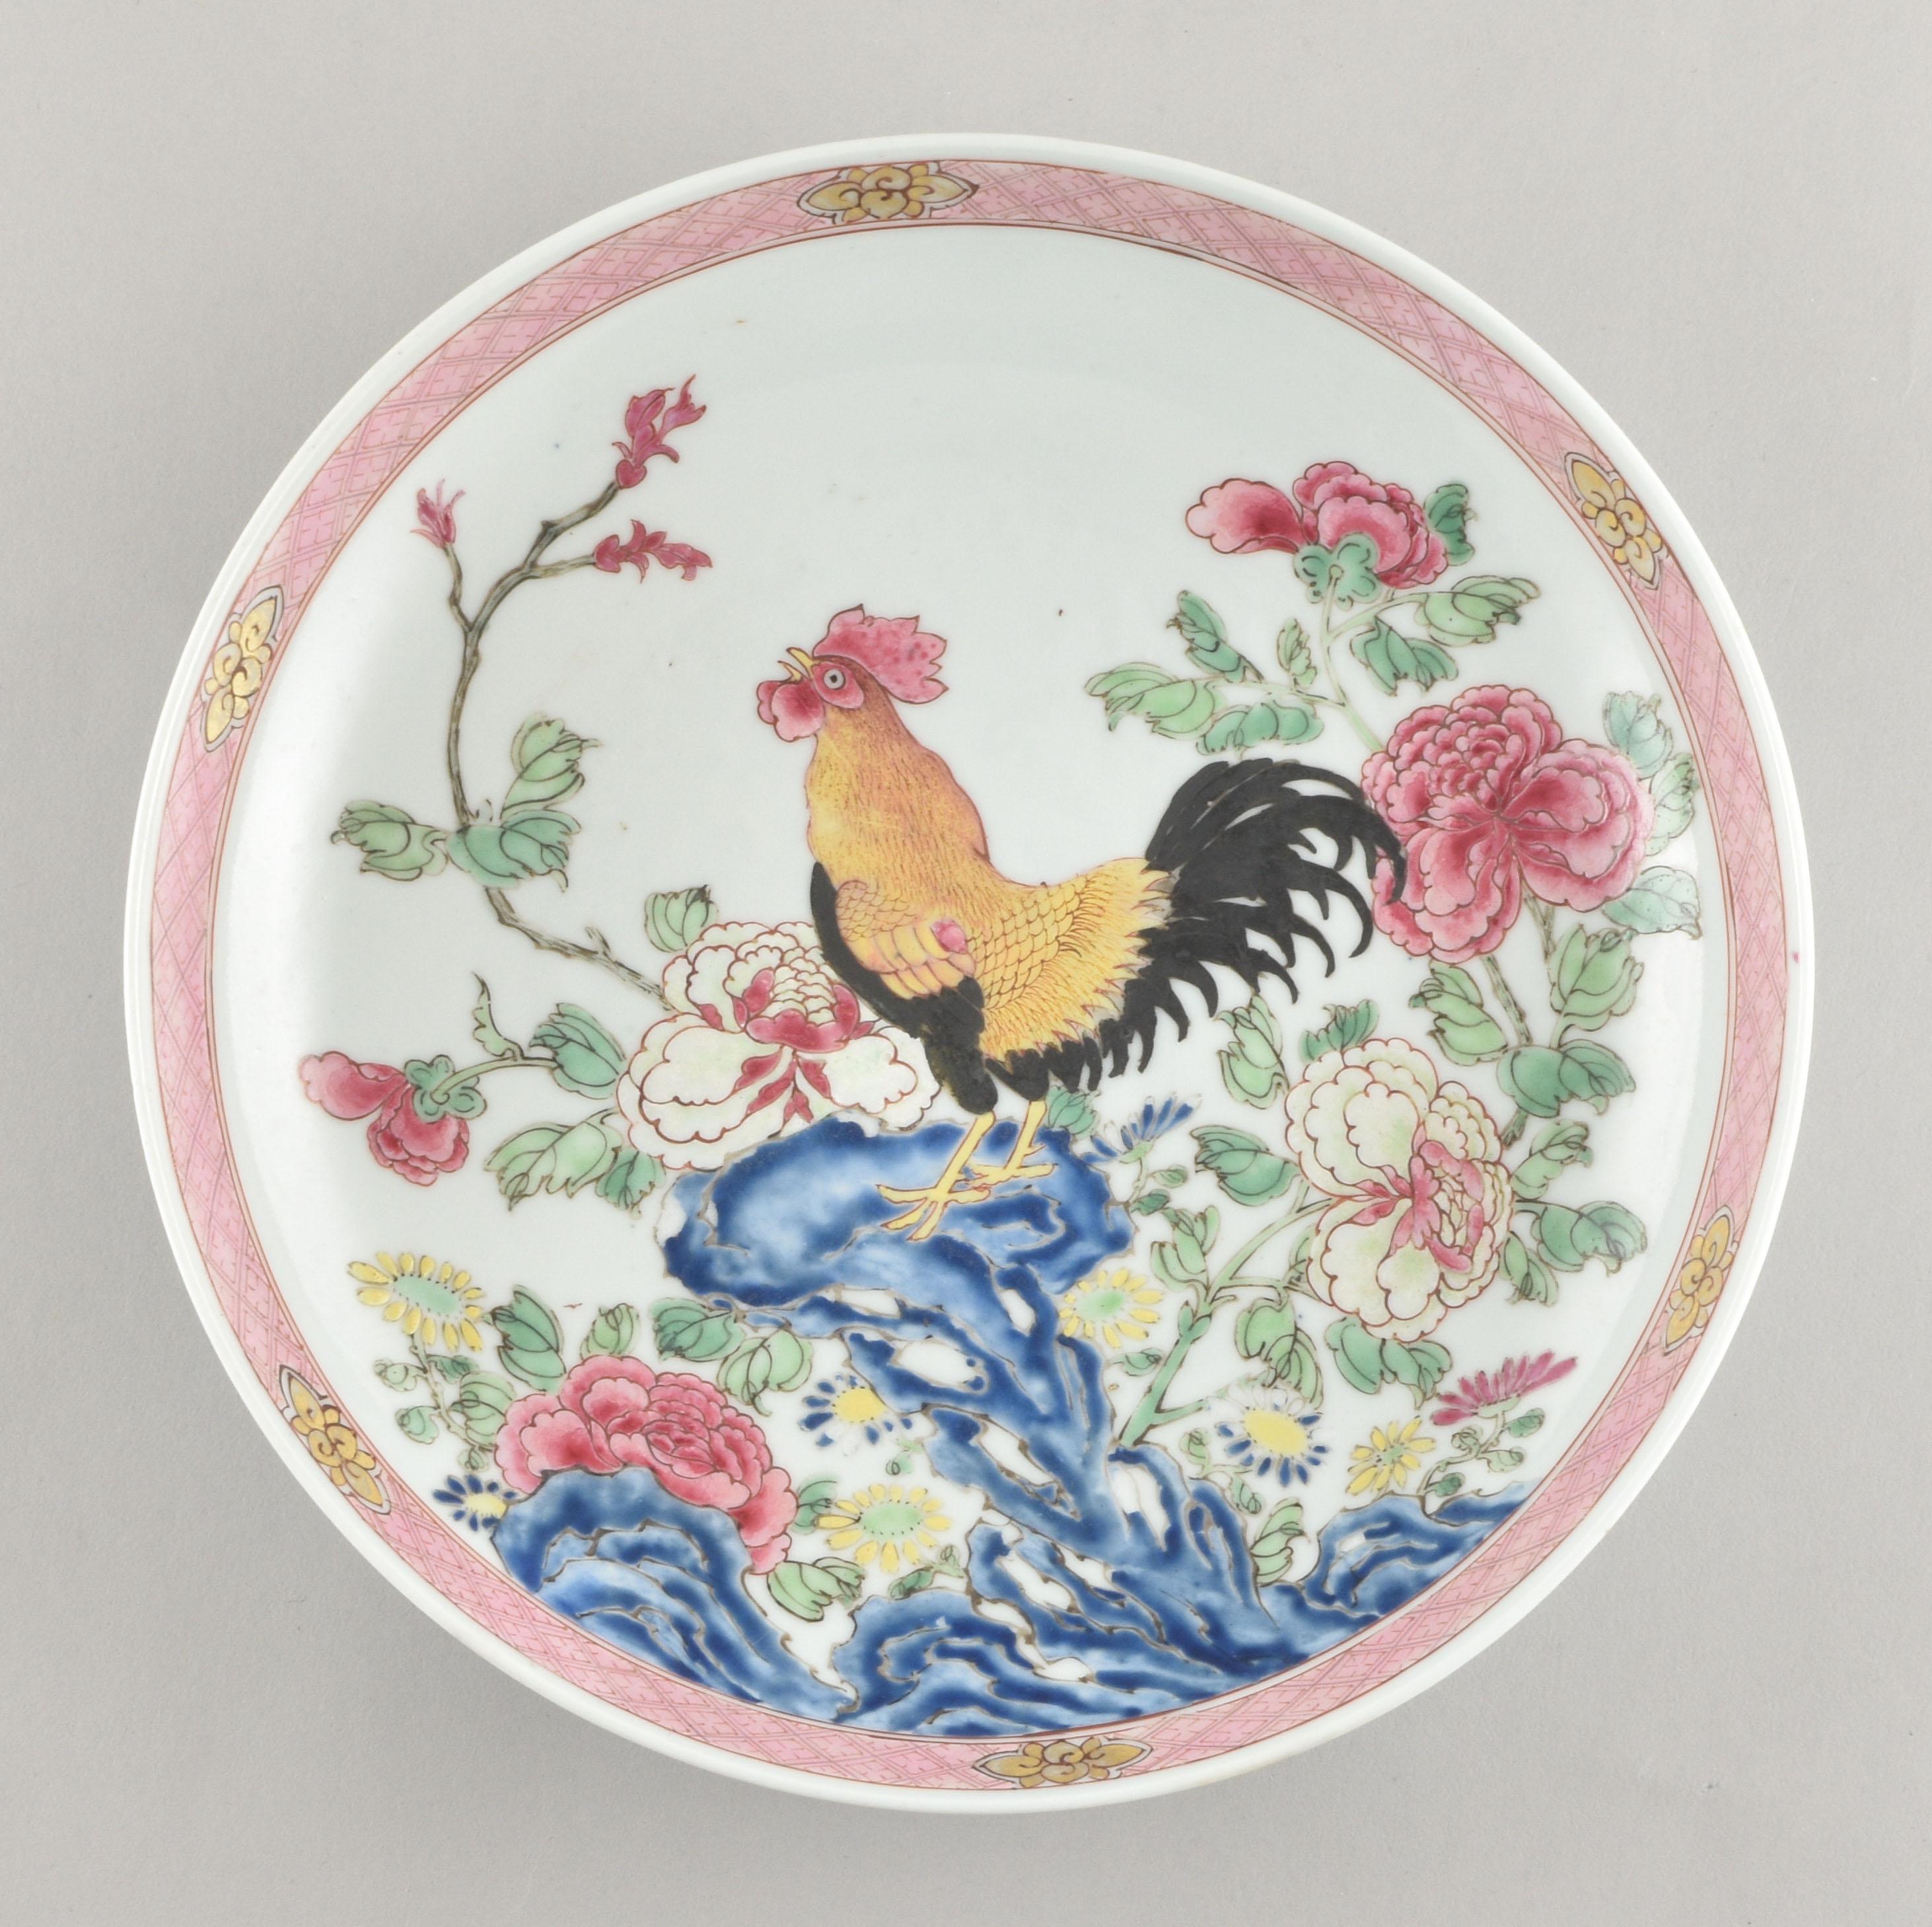 Famille rose Porcelain Yongzheng period (1723-1735), China